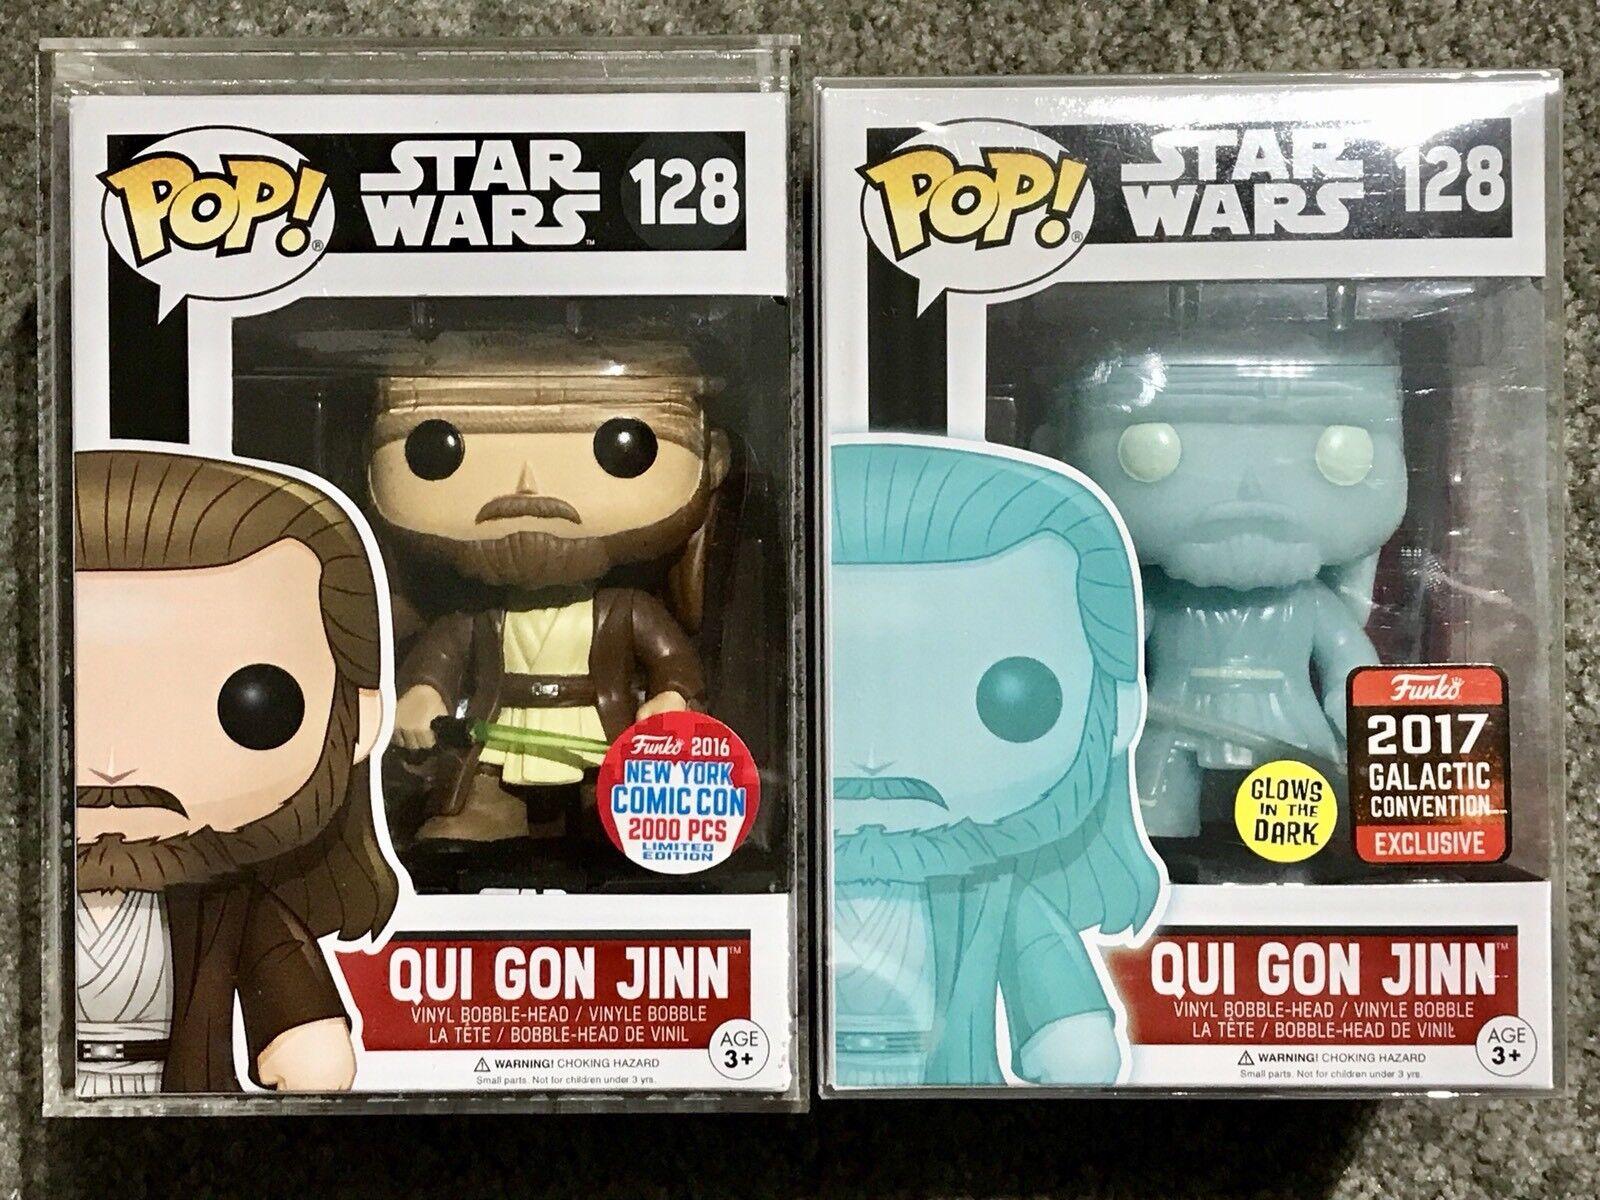 Pop Qui Gon Jinn Funko NYCC 2016 LE 2000Pcs & 2017 Galactic Convention Star Wars